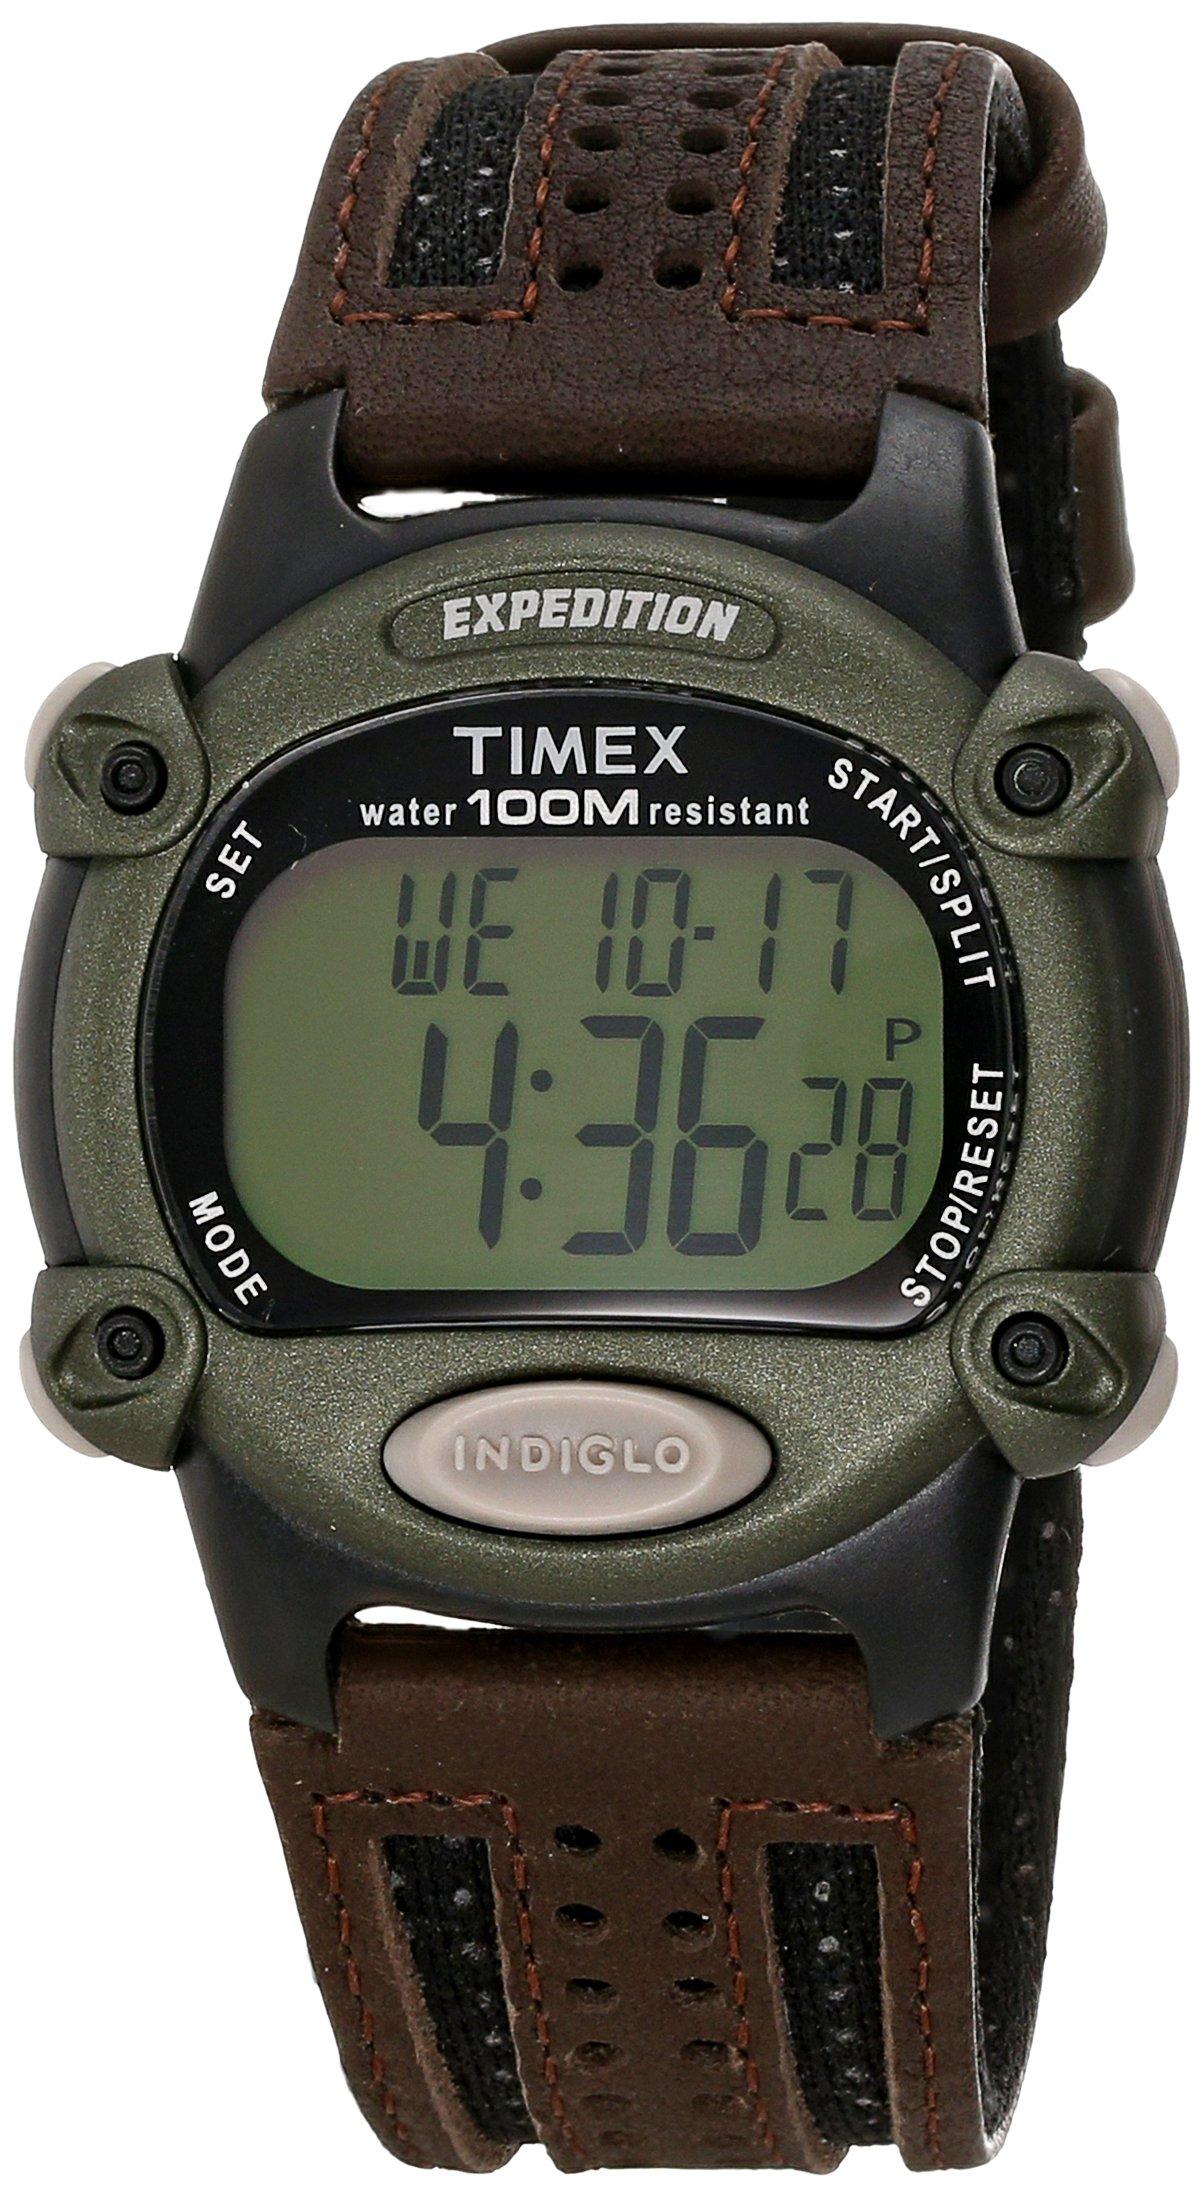 Timex Expedition Classic Digital Chrono Alarm Timer 41mm Watch by Timex